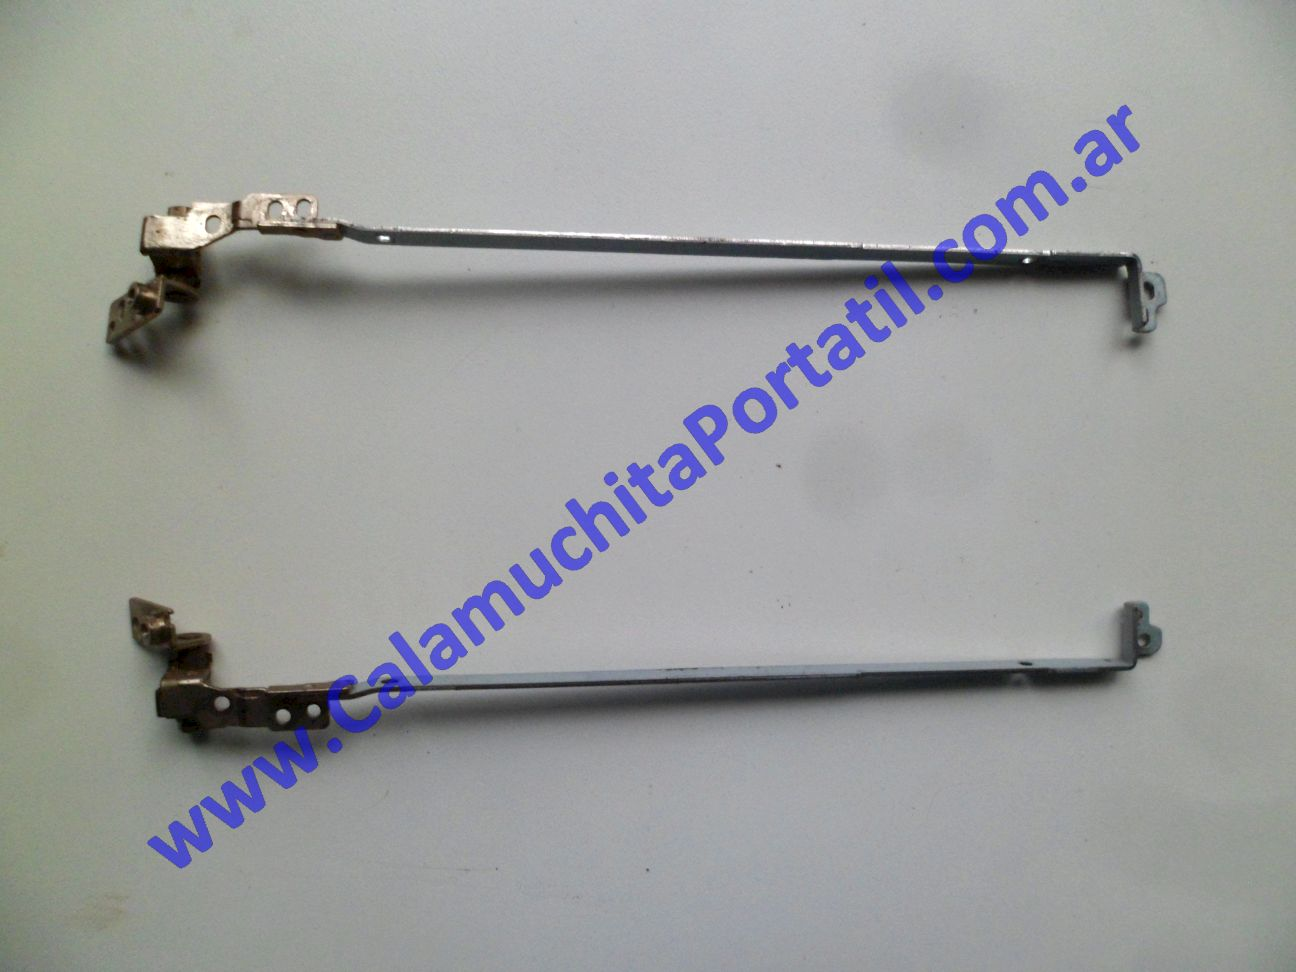 0534LBI Bisagras Lenovo IdeaPad S10-2 / 2957